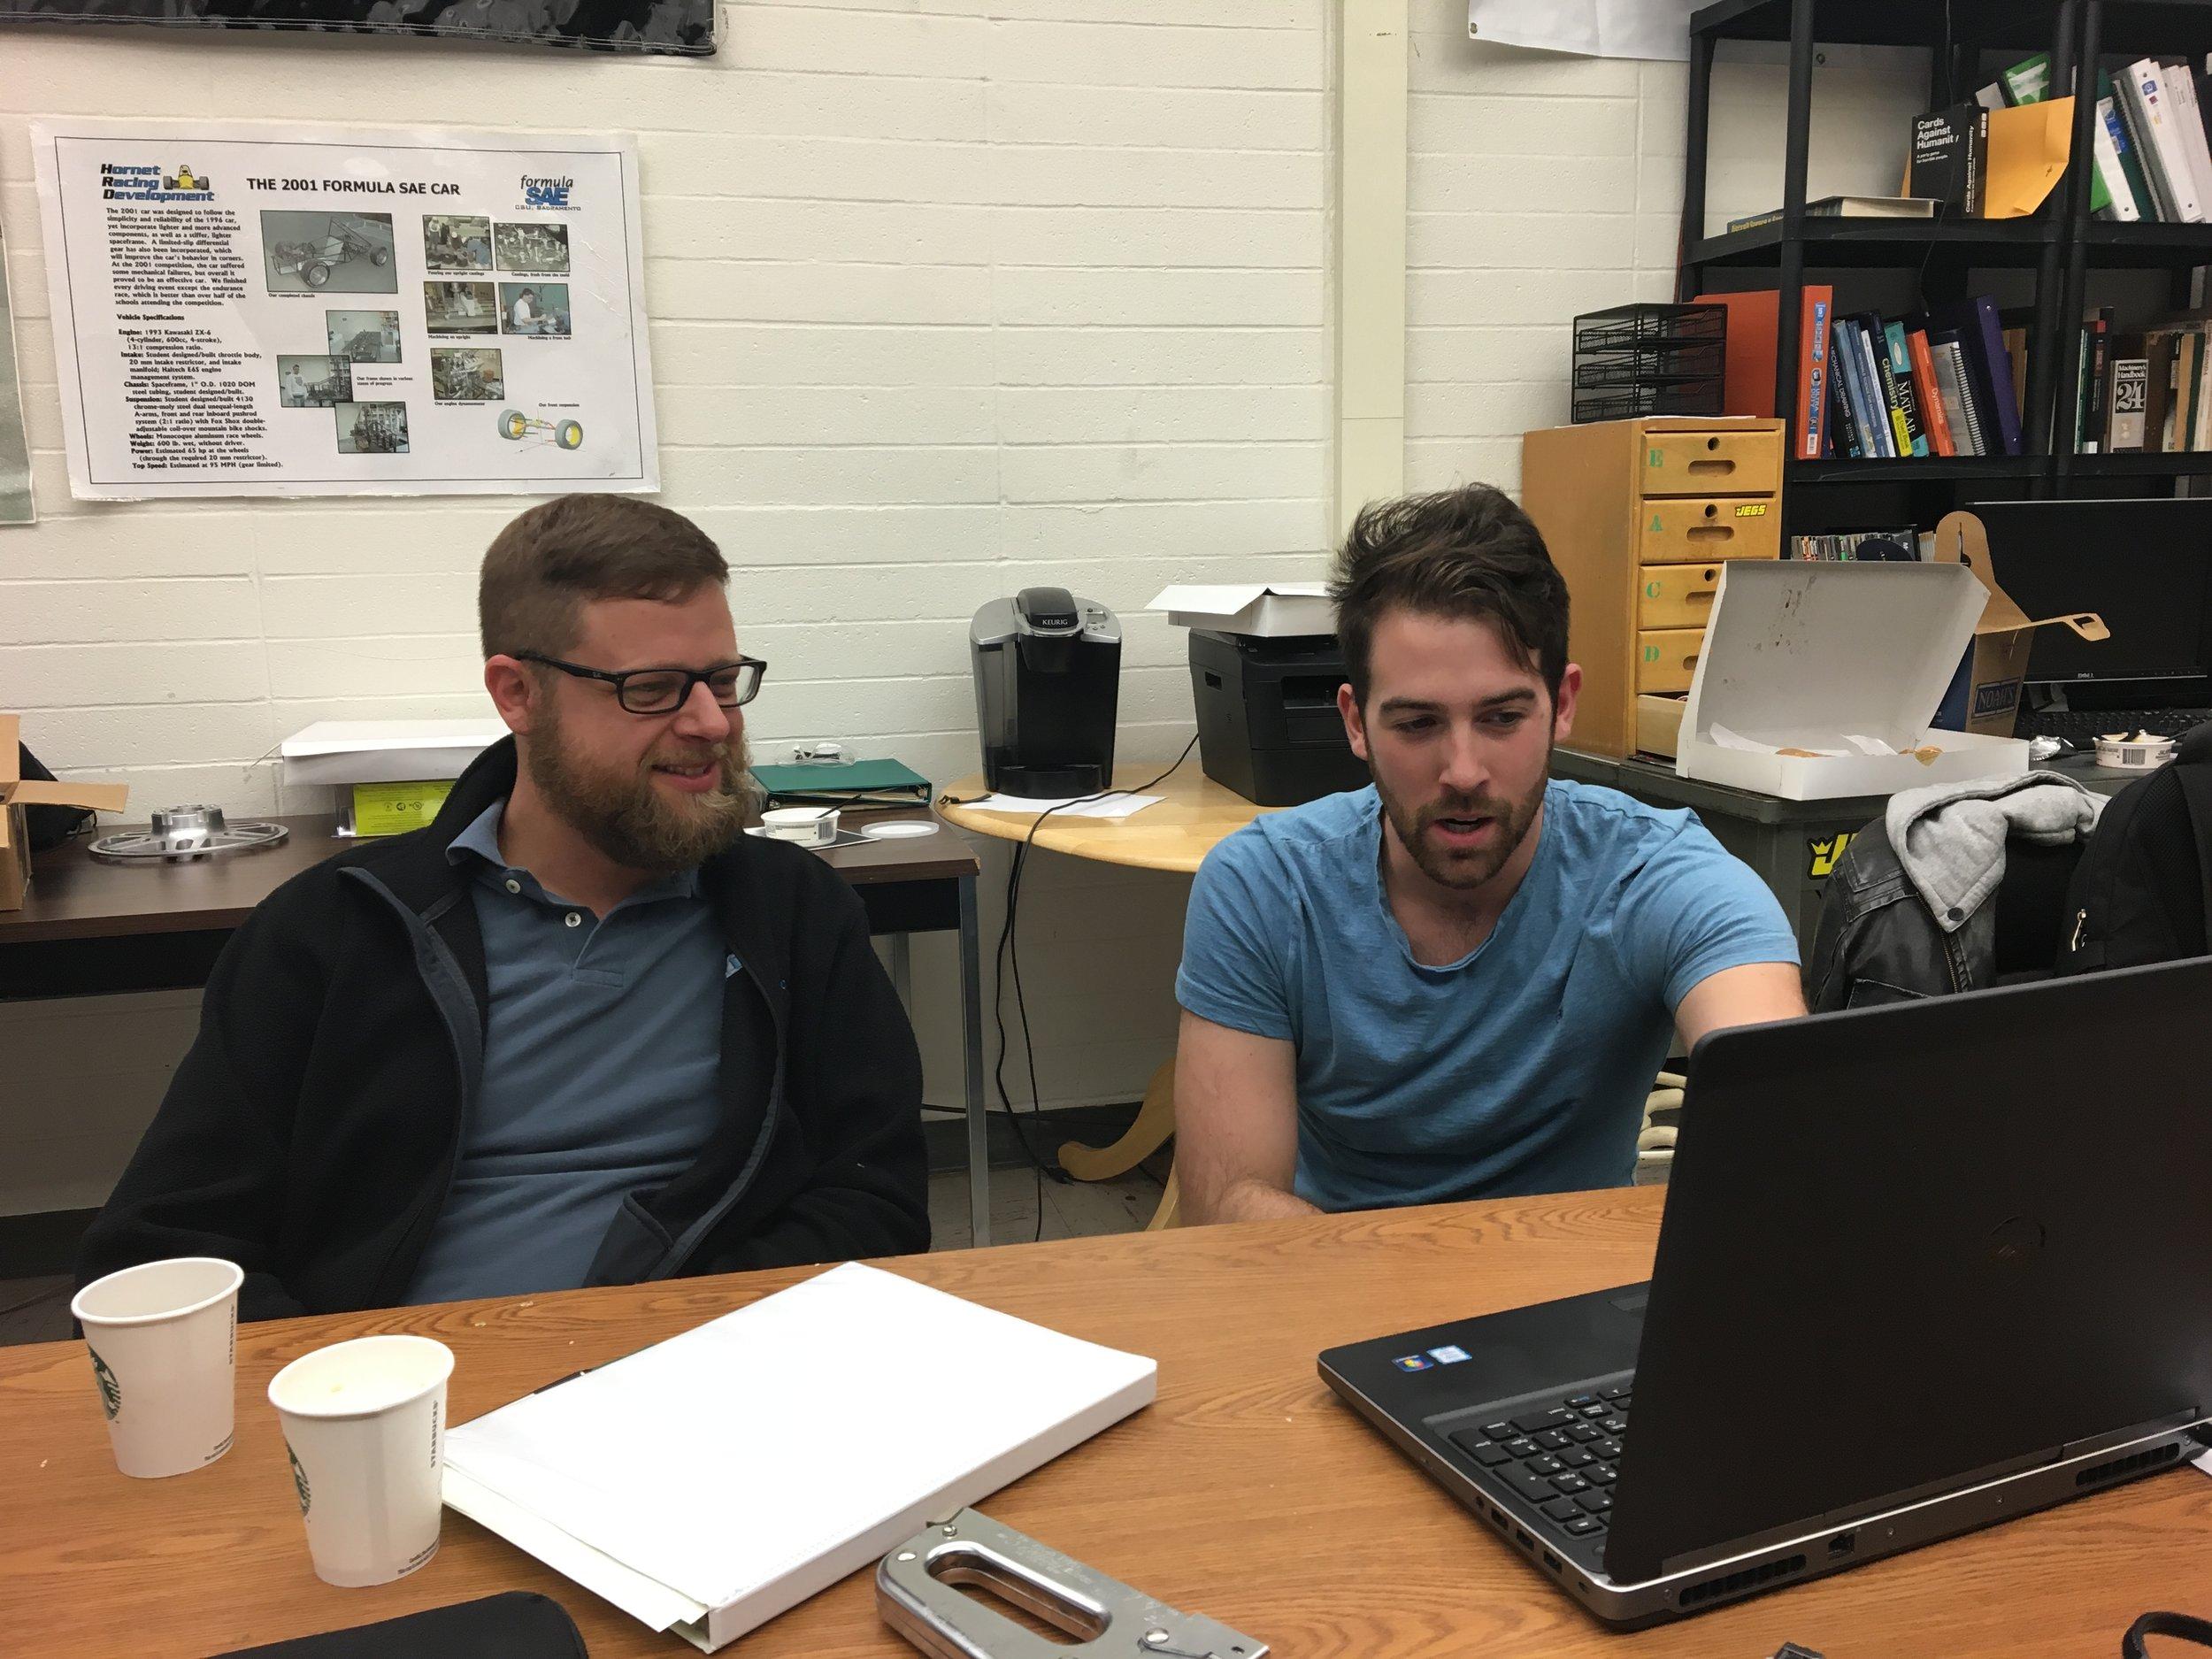 Ron and John discussing intake design